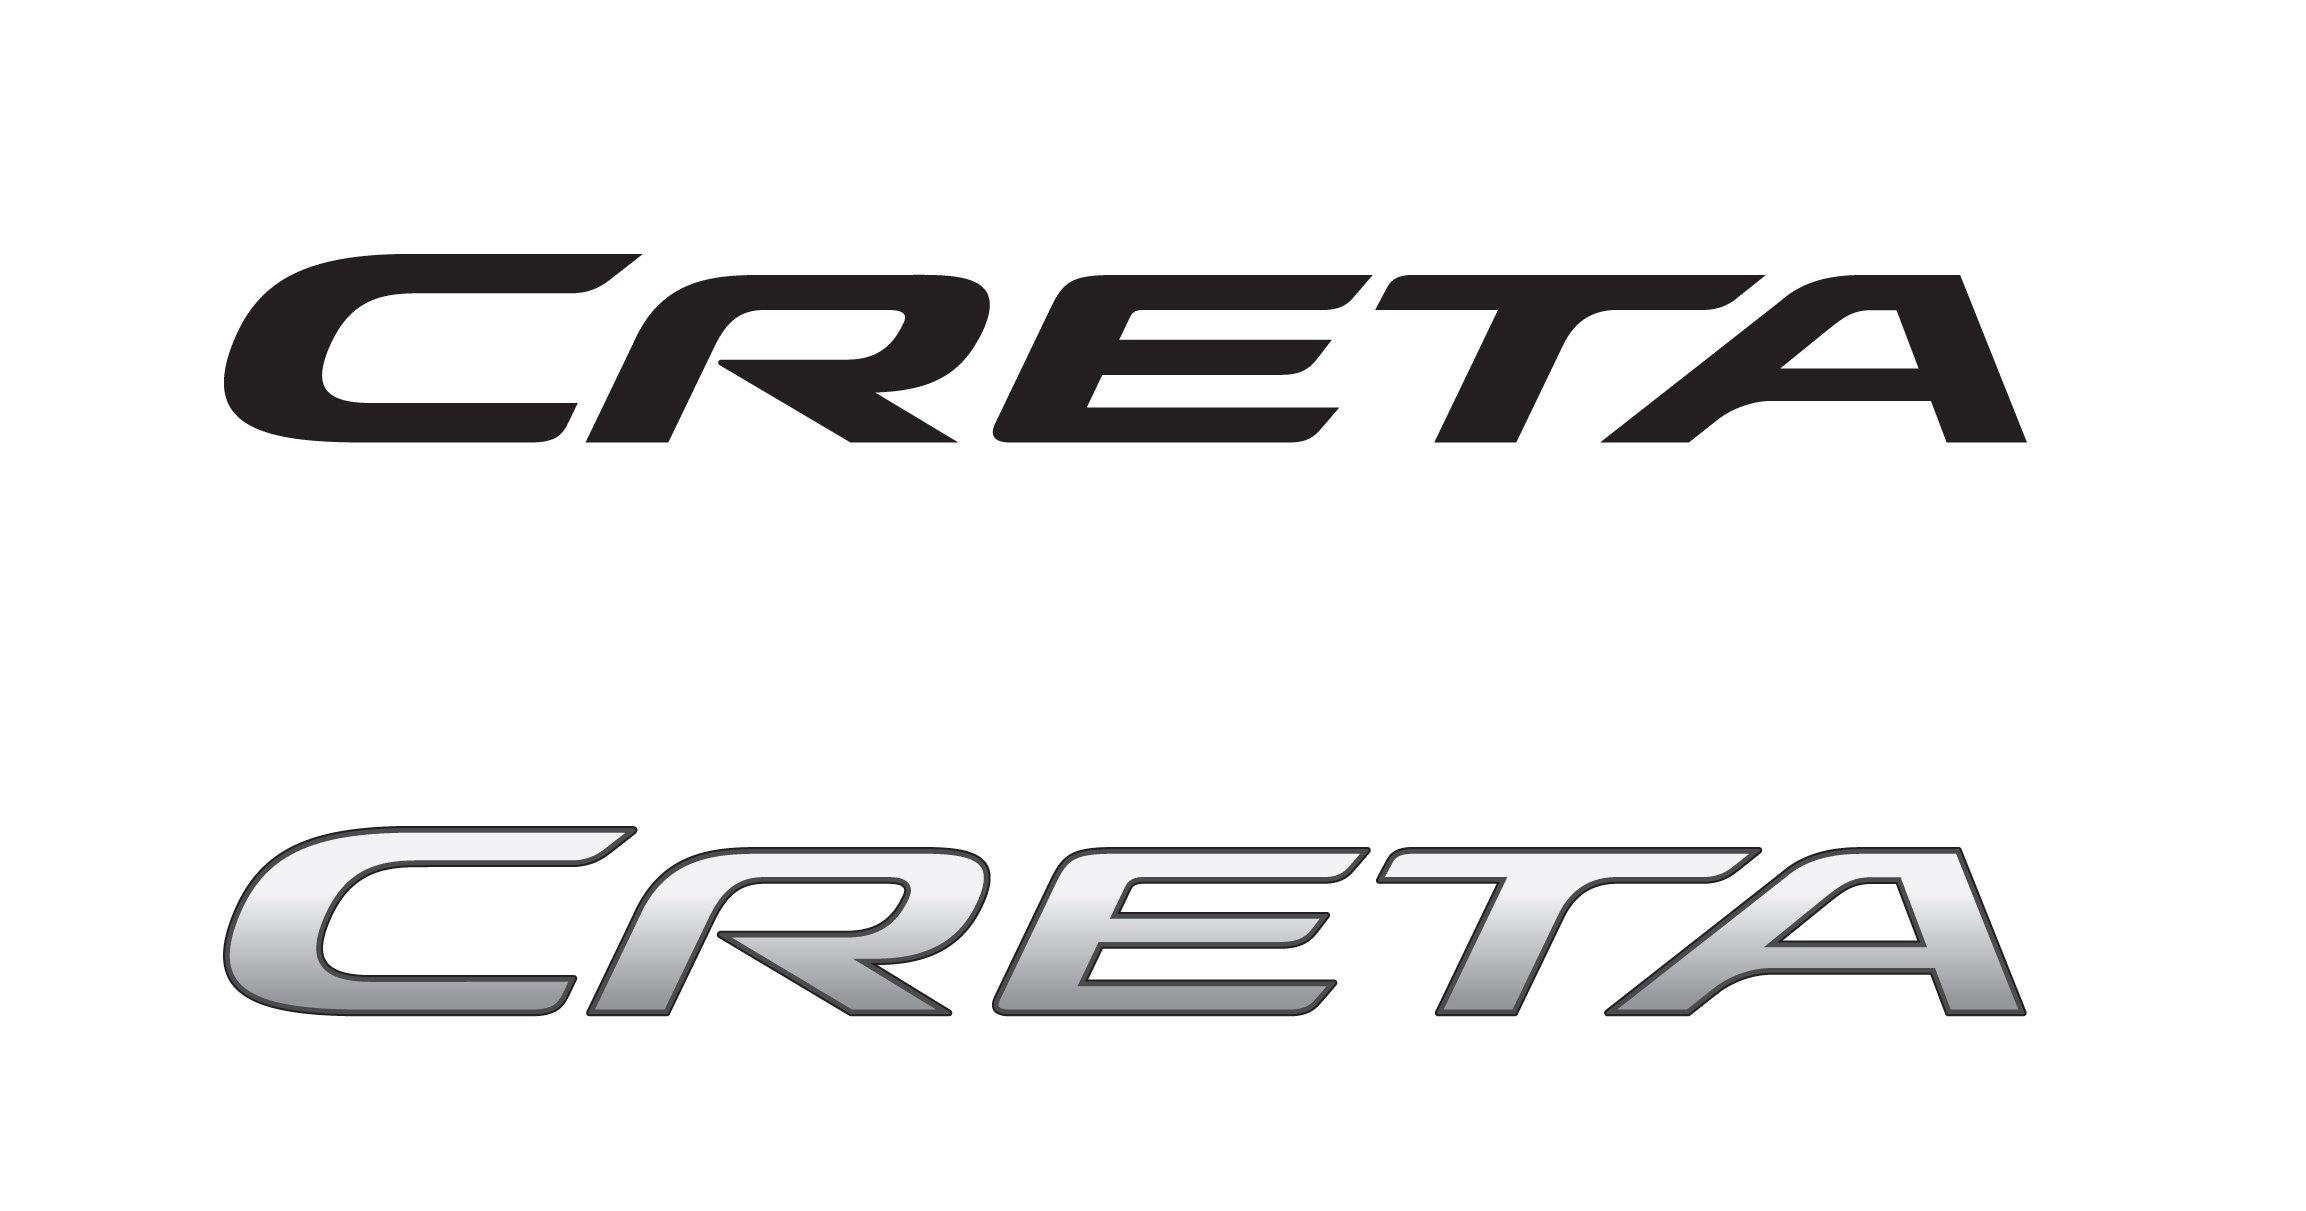 эмблема Hyundai Creta